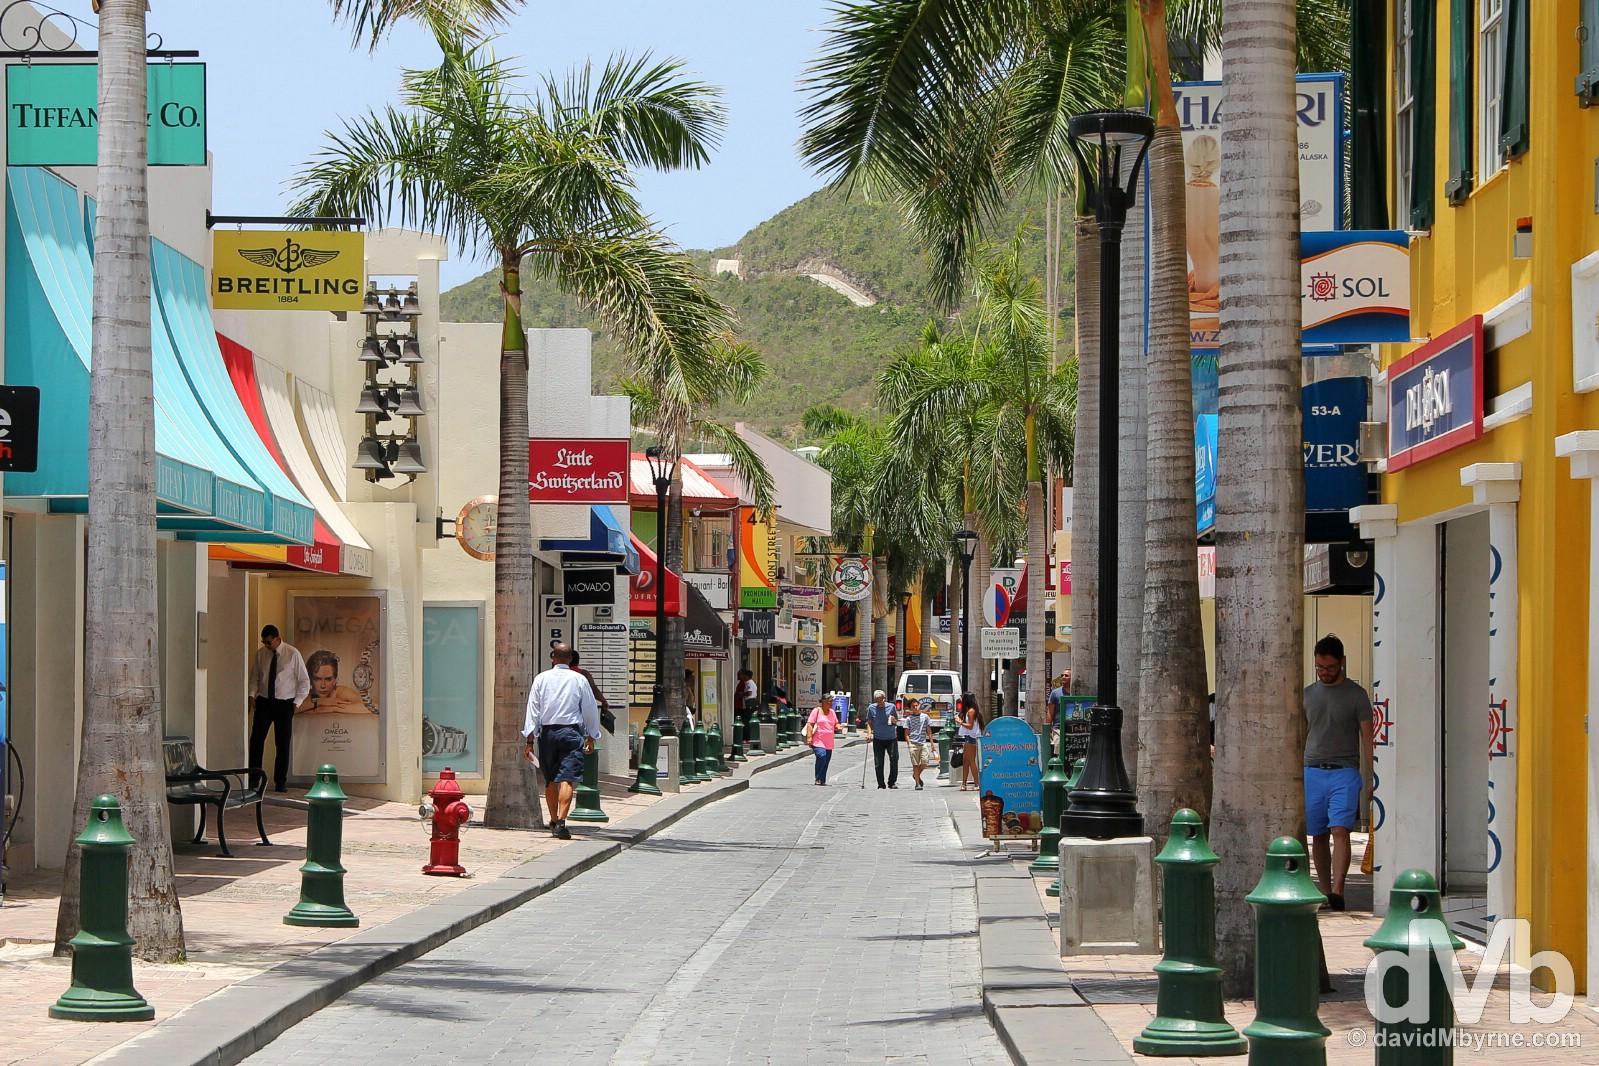 Shopping in Philipsburg, Sint Maarten, Lesser Antilles. June 8, 2015.